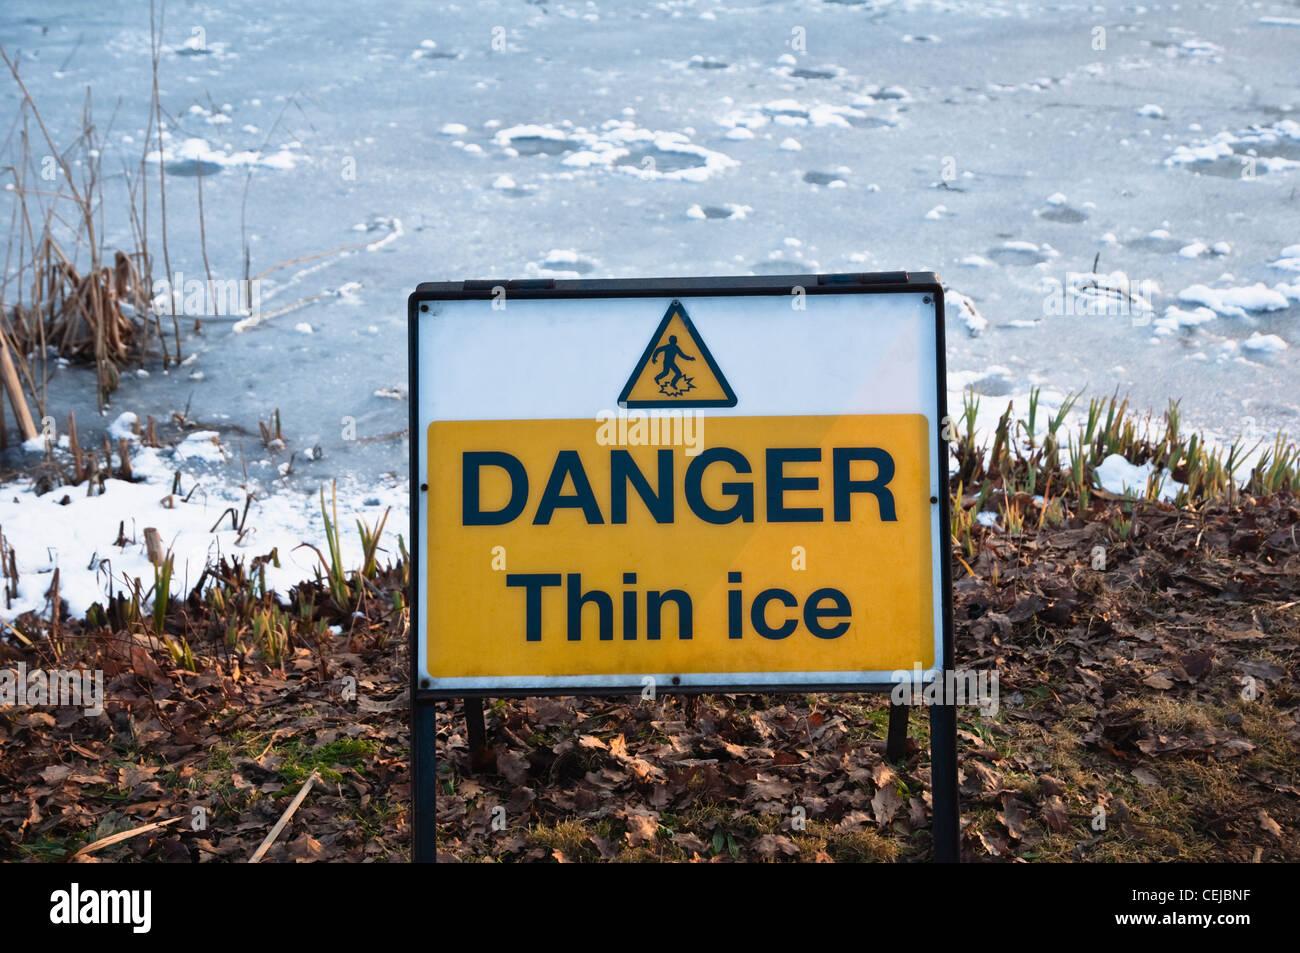 'Danger Thin Ice' sign beside frozen water. - Stock Image